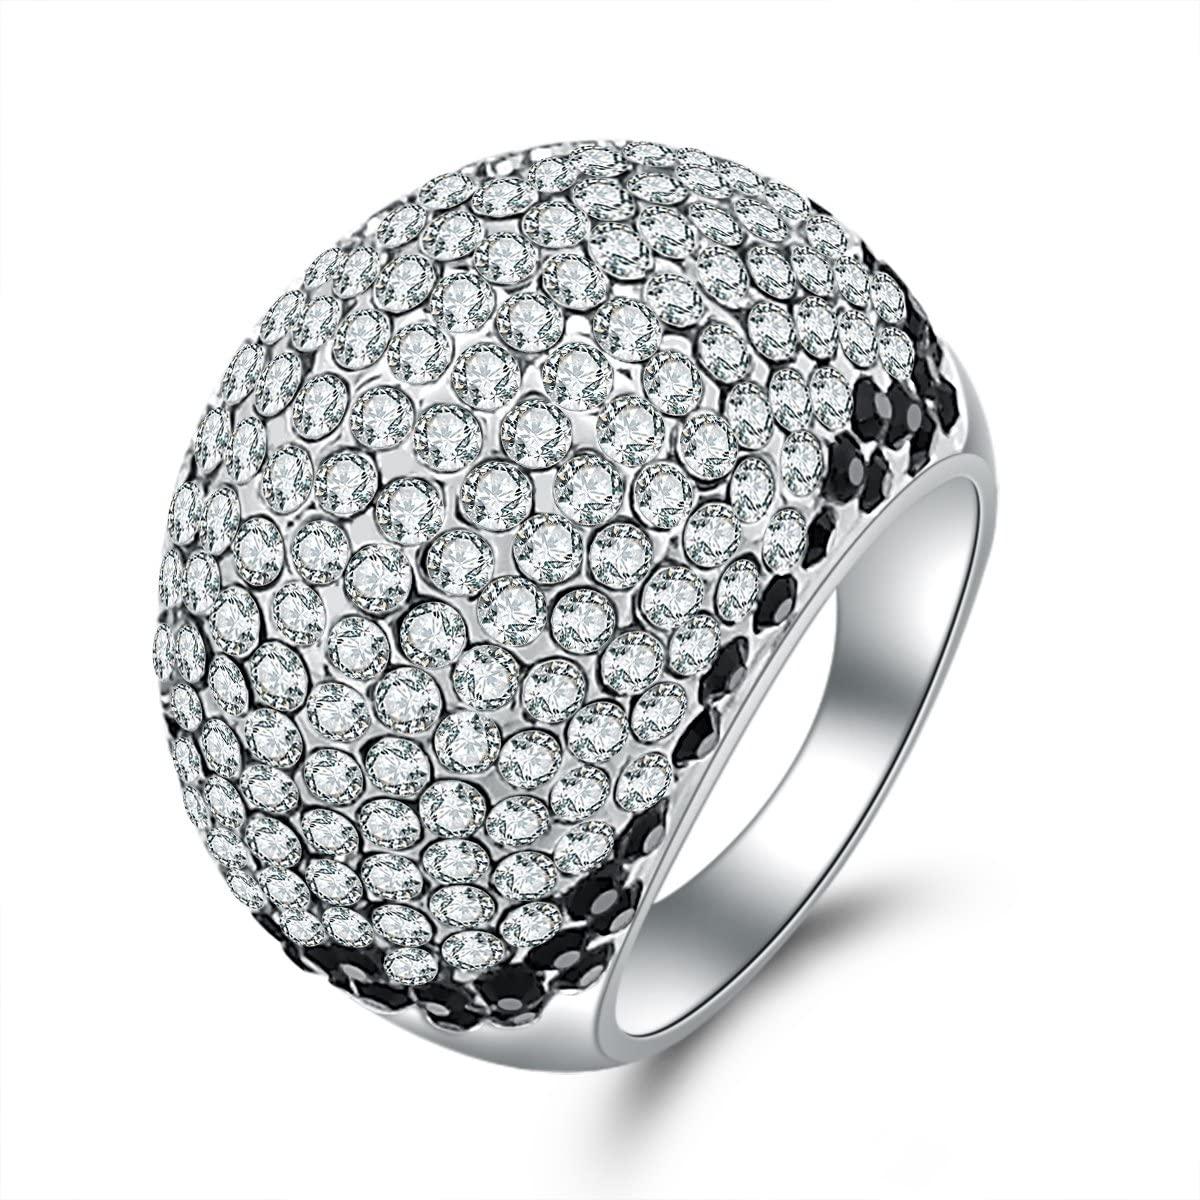 Carfeny Jewlery 14k White Gold Plated CZ Ring Band Cublic Zirocnia Wedding Engagement Rings for Women